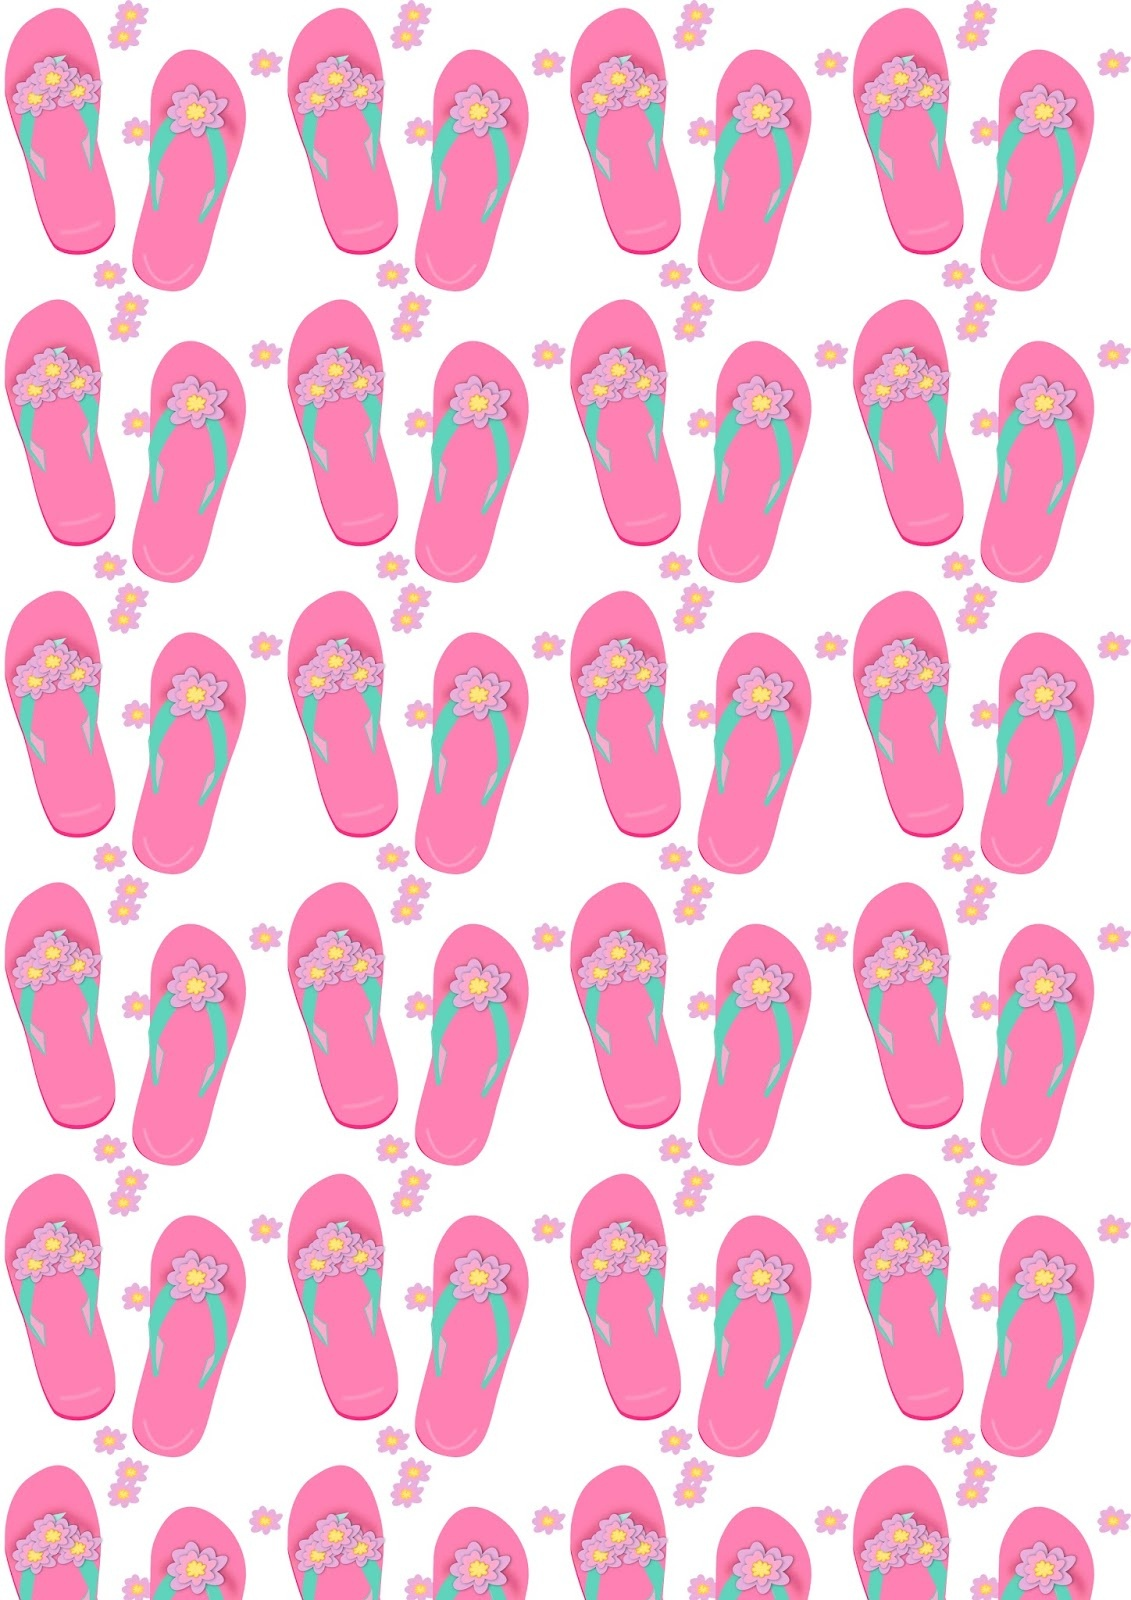 Free Flip Flop Pattern, Download Free Clip Art, Free Clip Art On - Free Printable Flip Flop Pattern